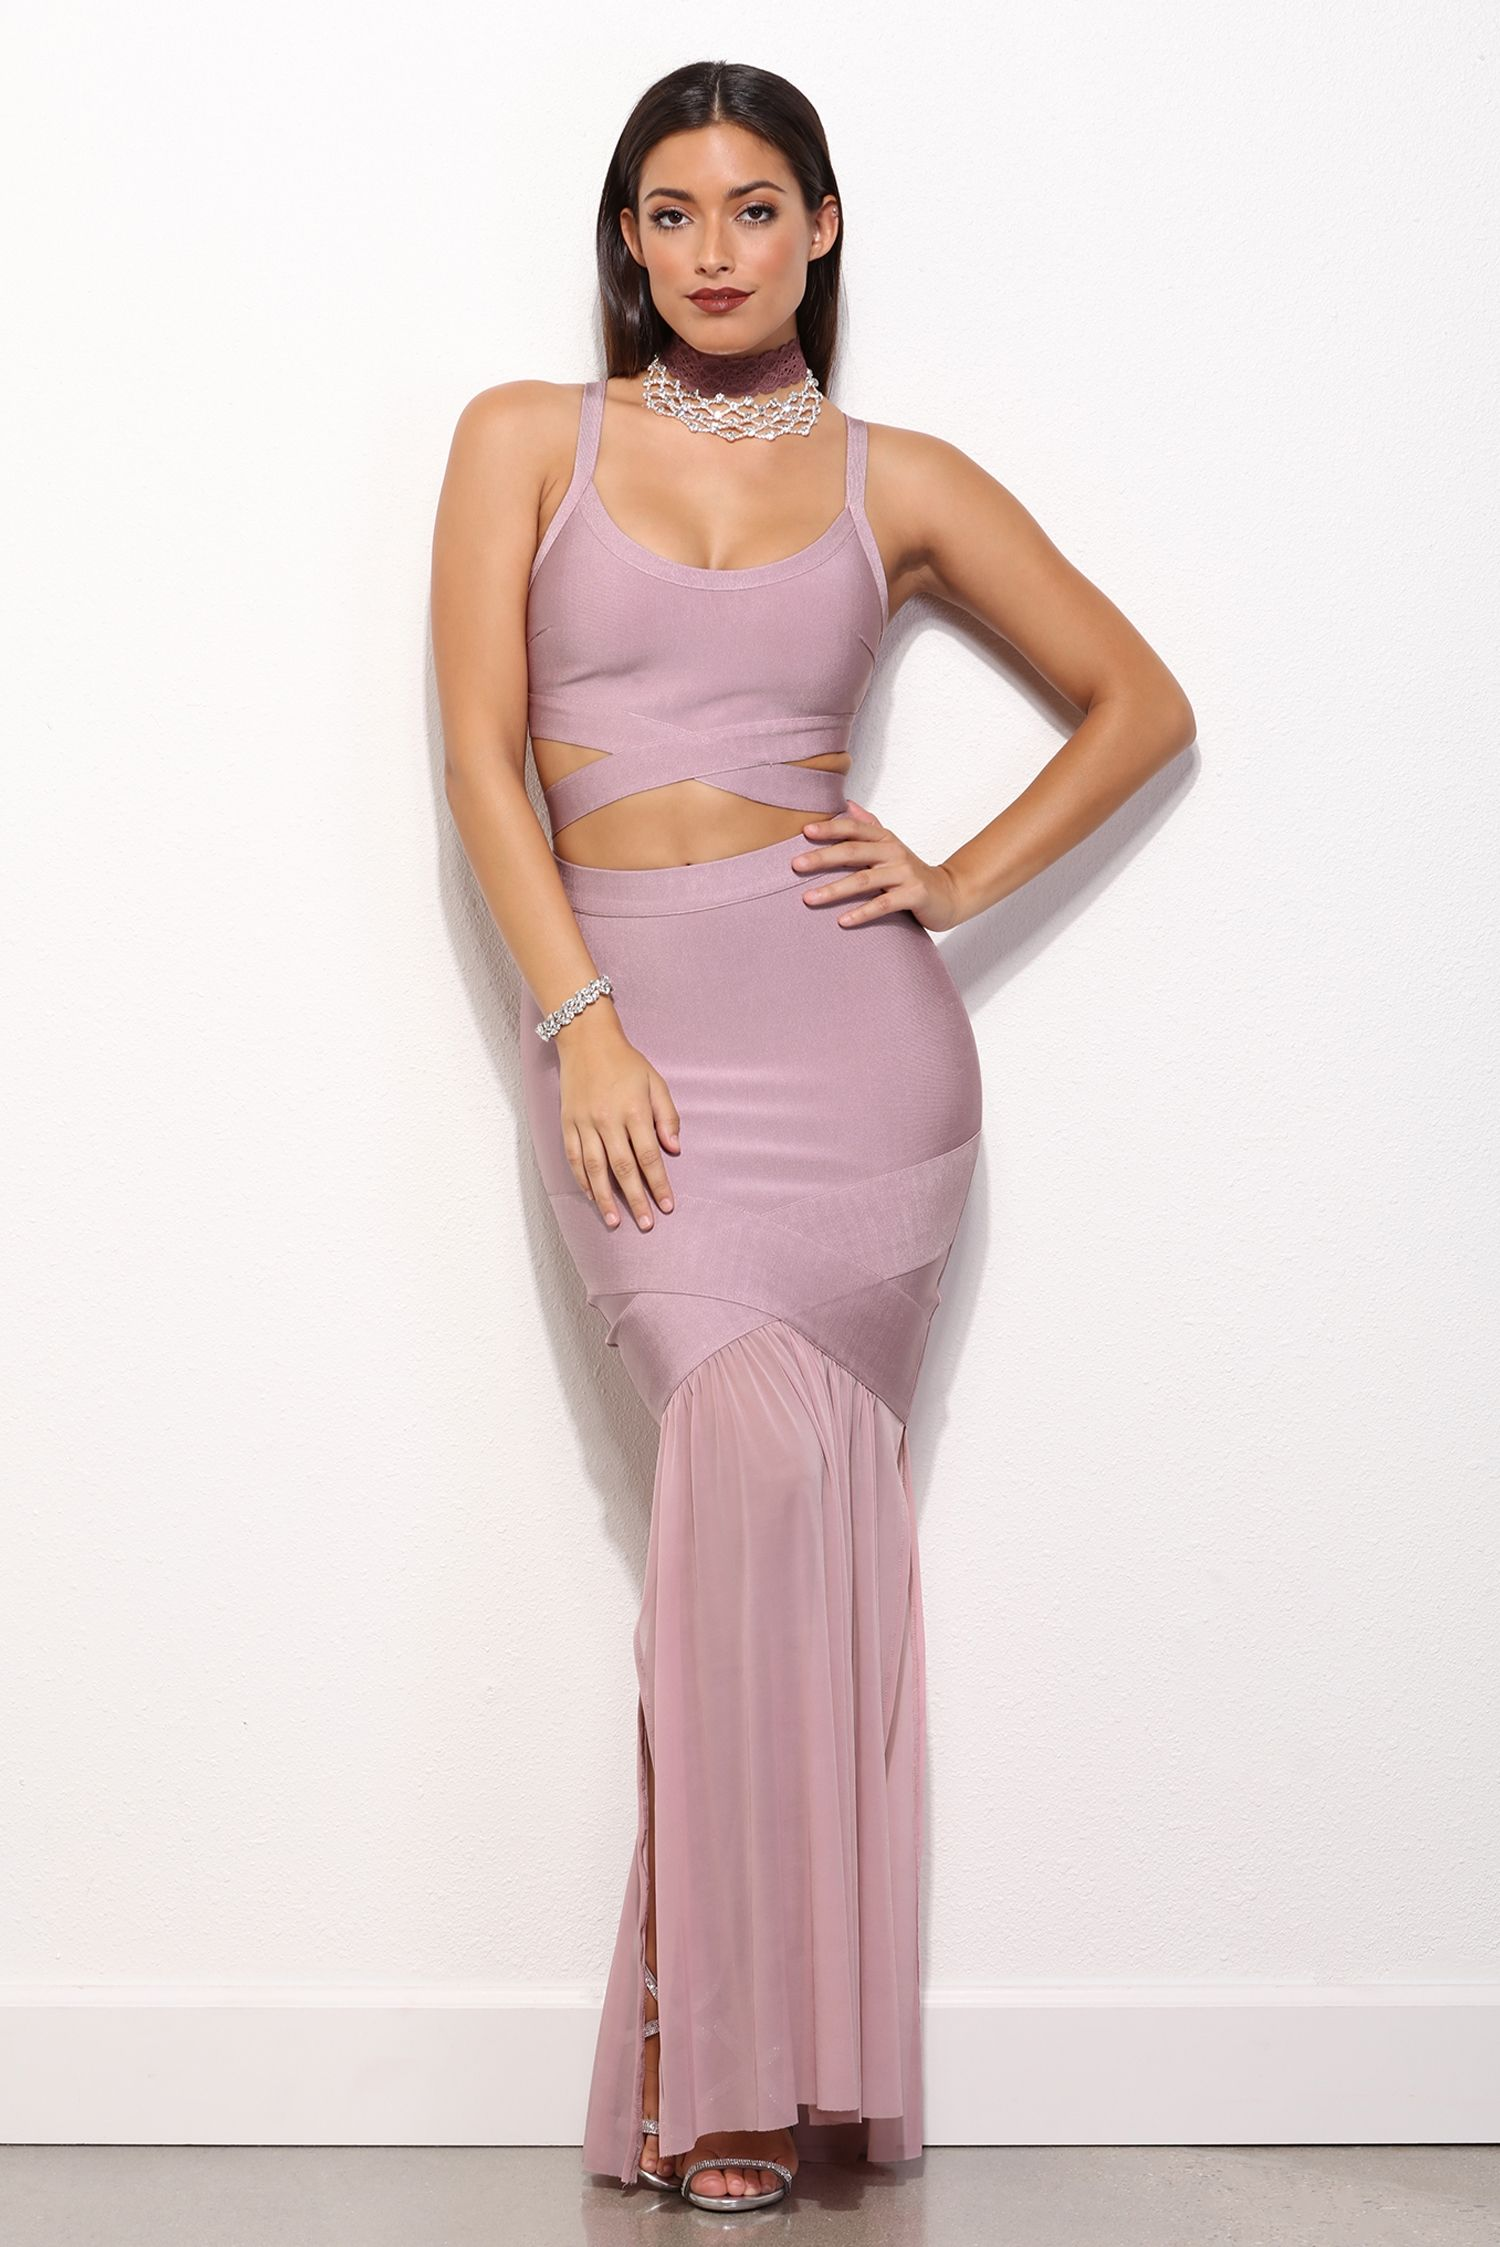 Alessia Mauve Bandage Prom Dress | windsor | p r o m | Pinterest ...